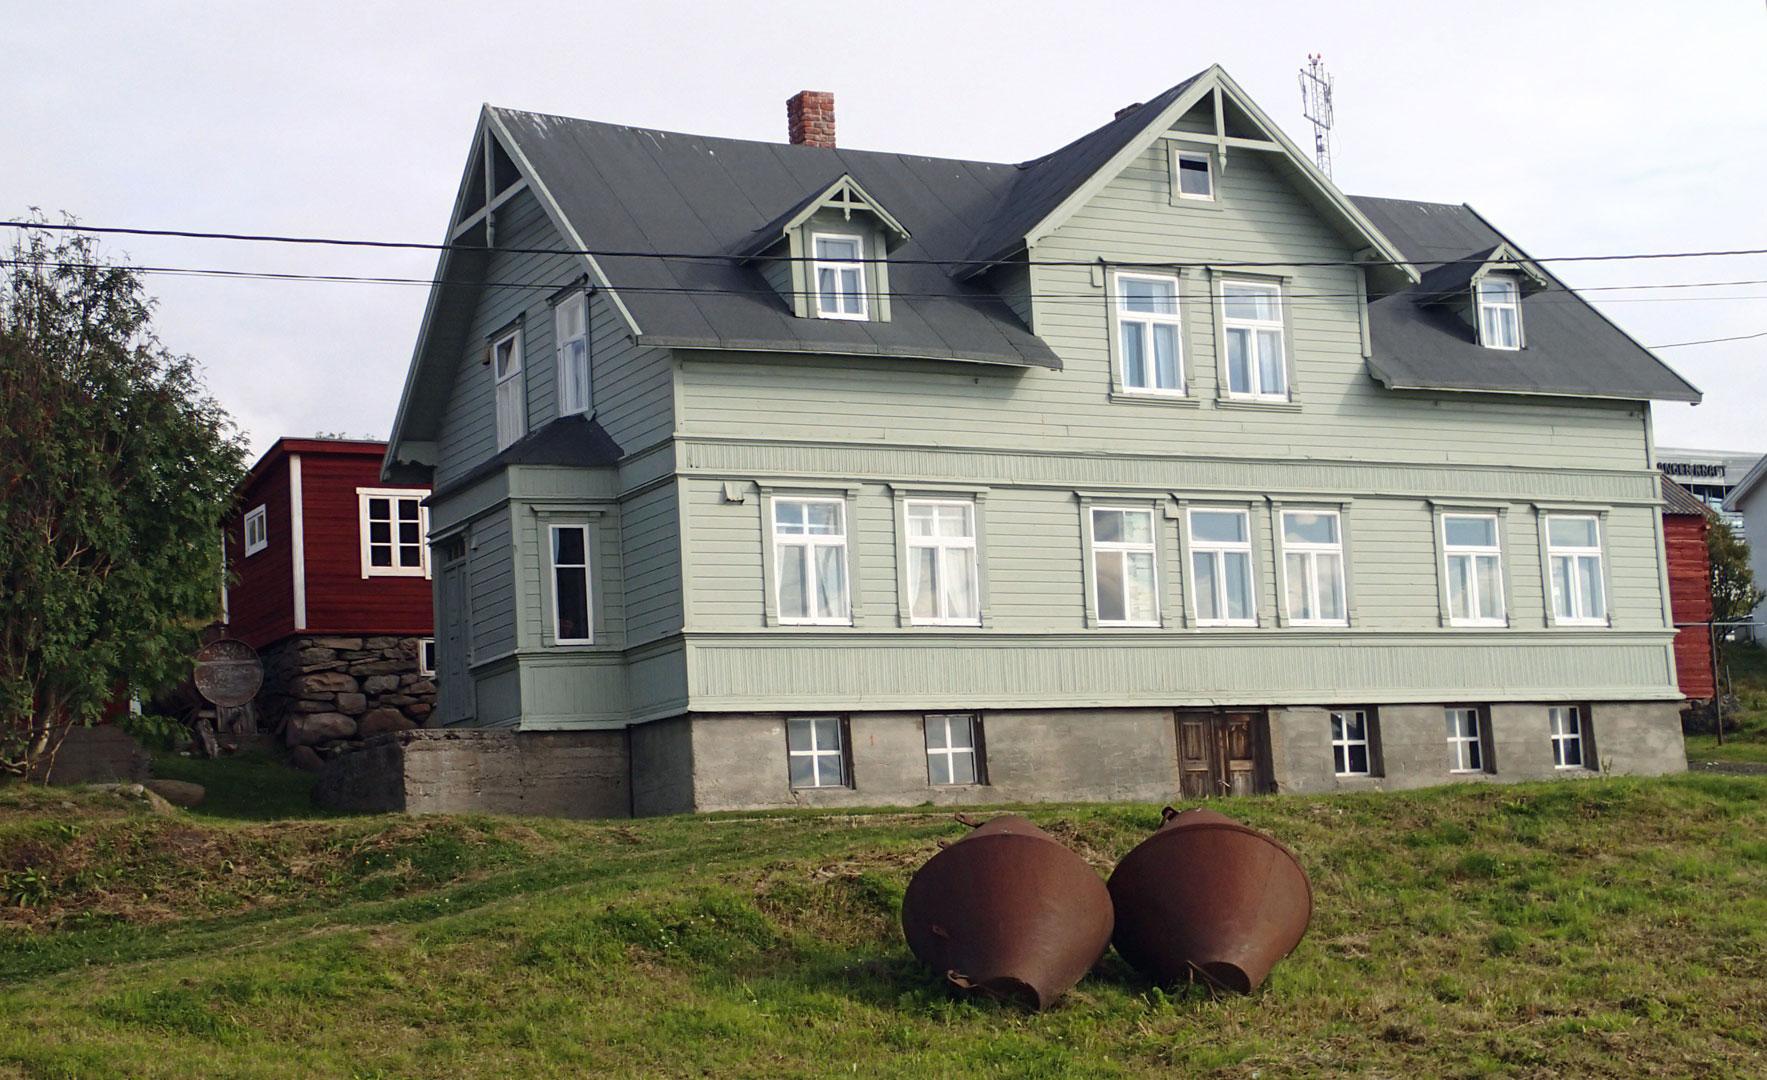 Bolighuset til Bietilægården i Vadsø. Foto: Siri Wolland Riksantikvaren